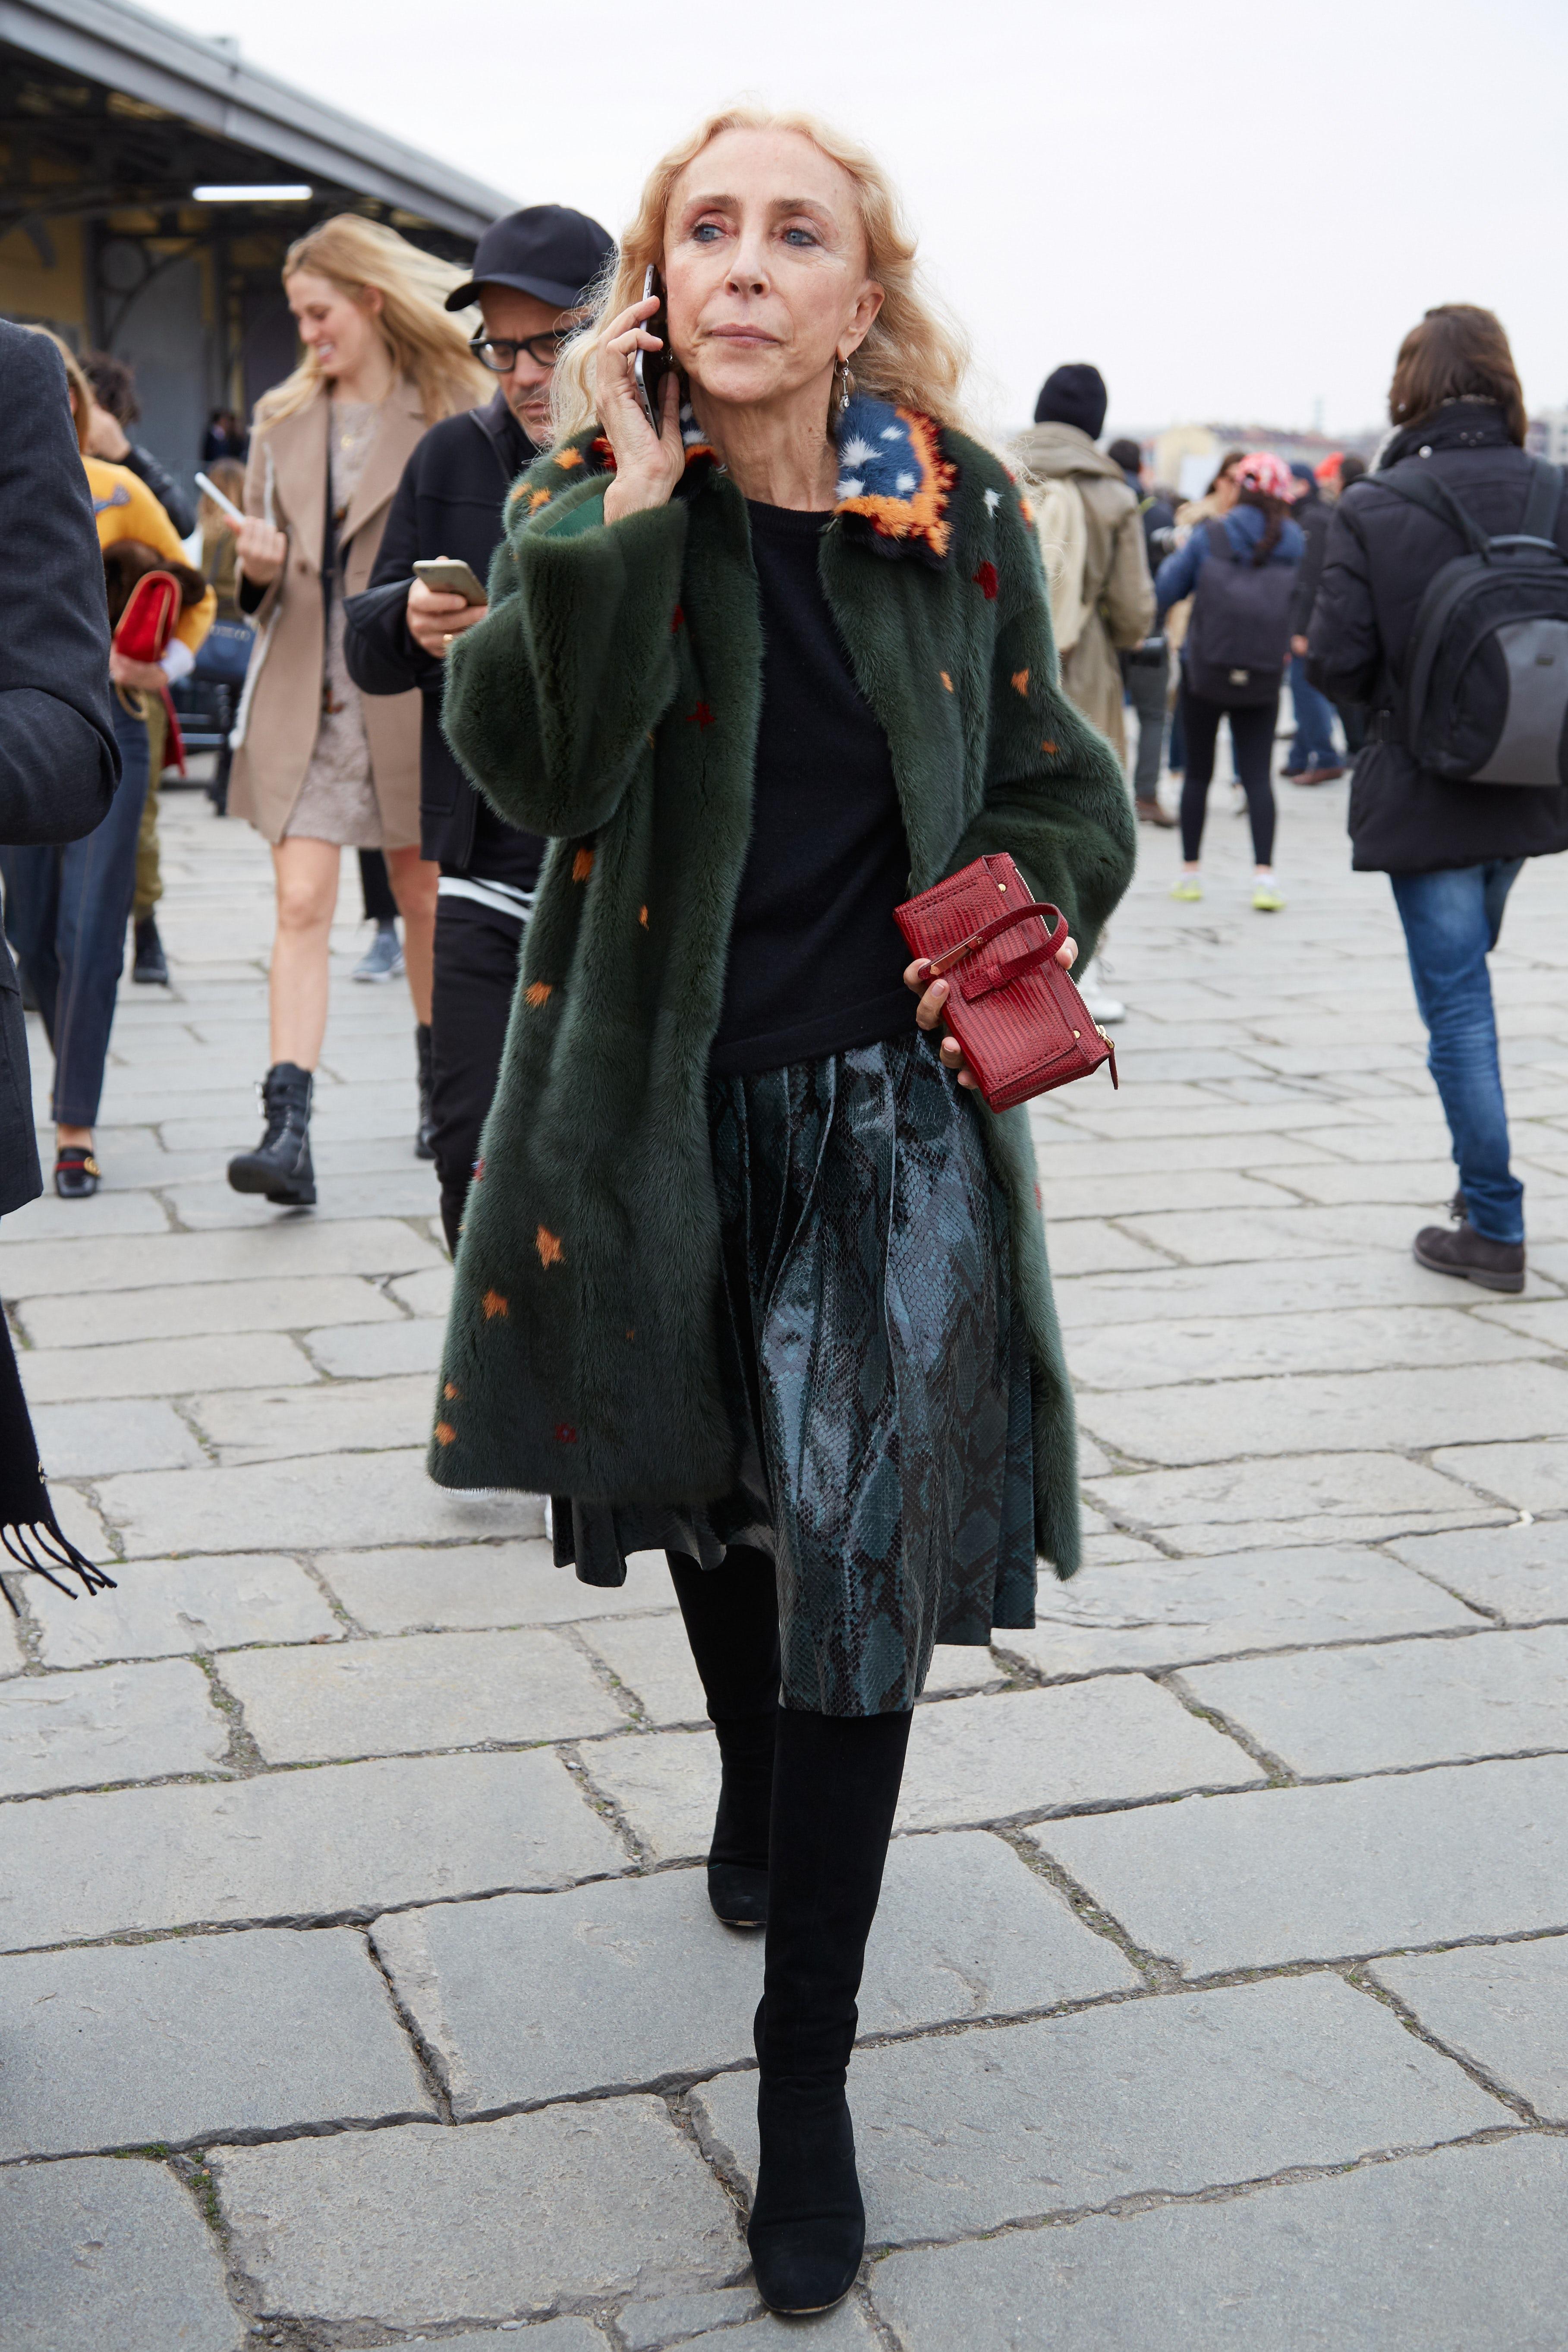 Franca Sozzani at Milan Fashion Week last February | Source: Shutterstock